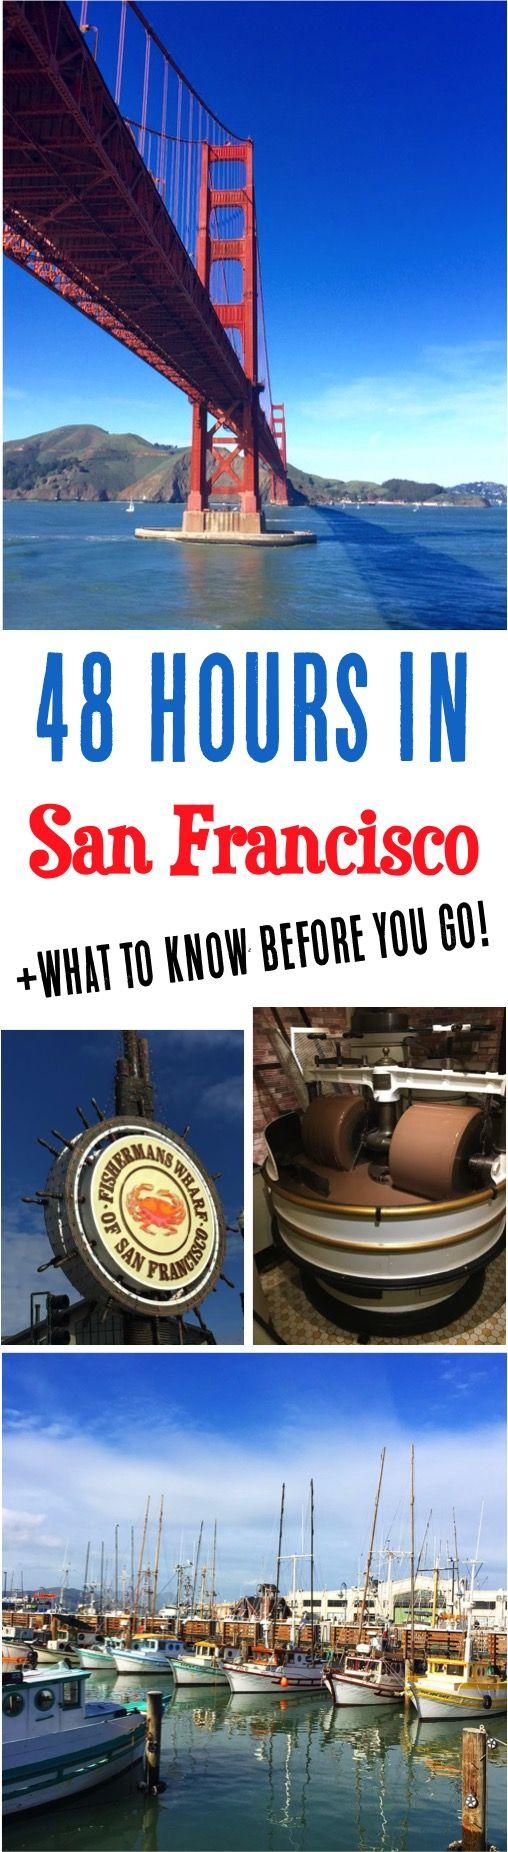 San Francisco Travel!  Best sights and Top Restaurants in San Francisco!   NeverEndingJourneys.com